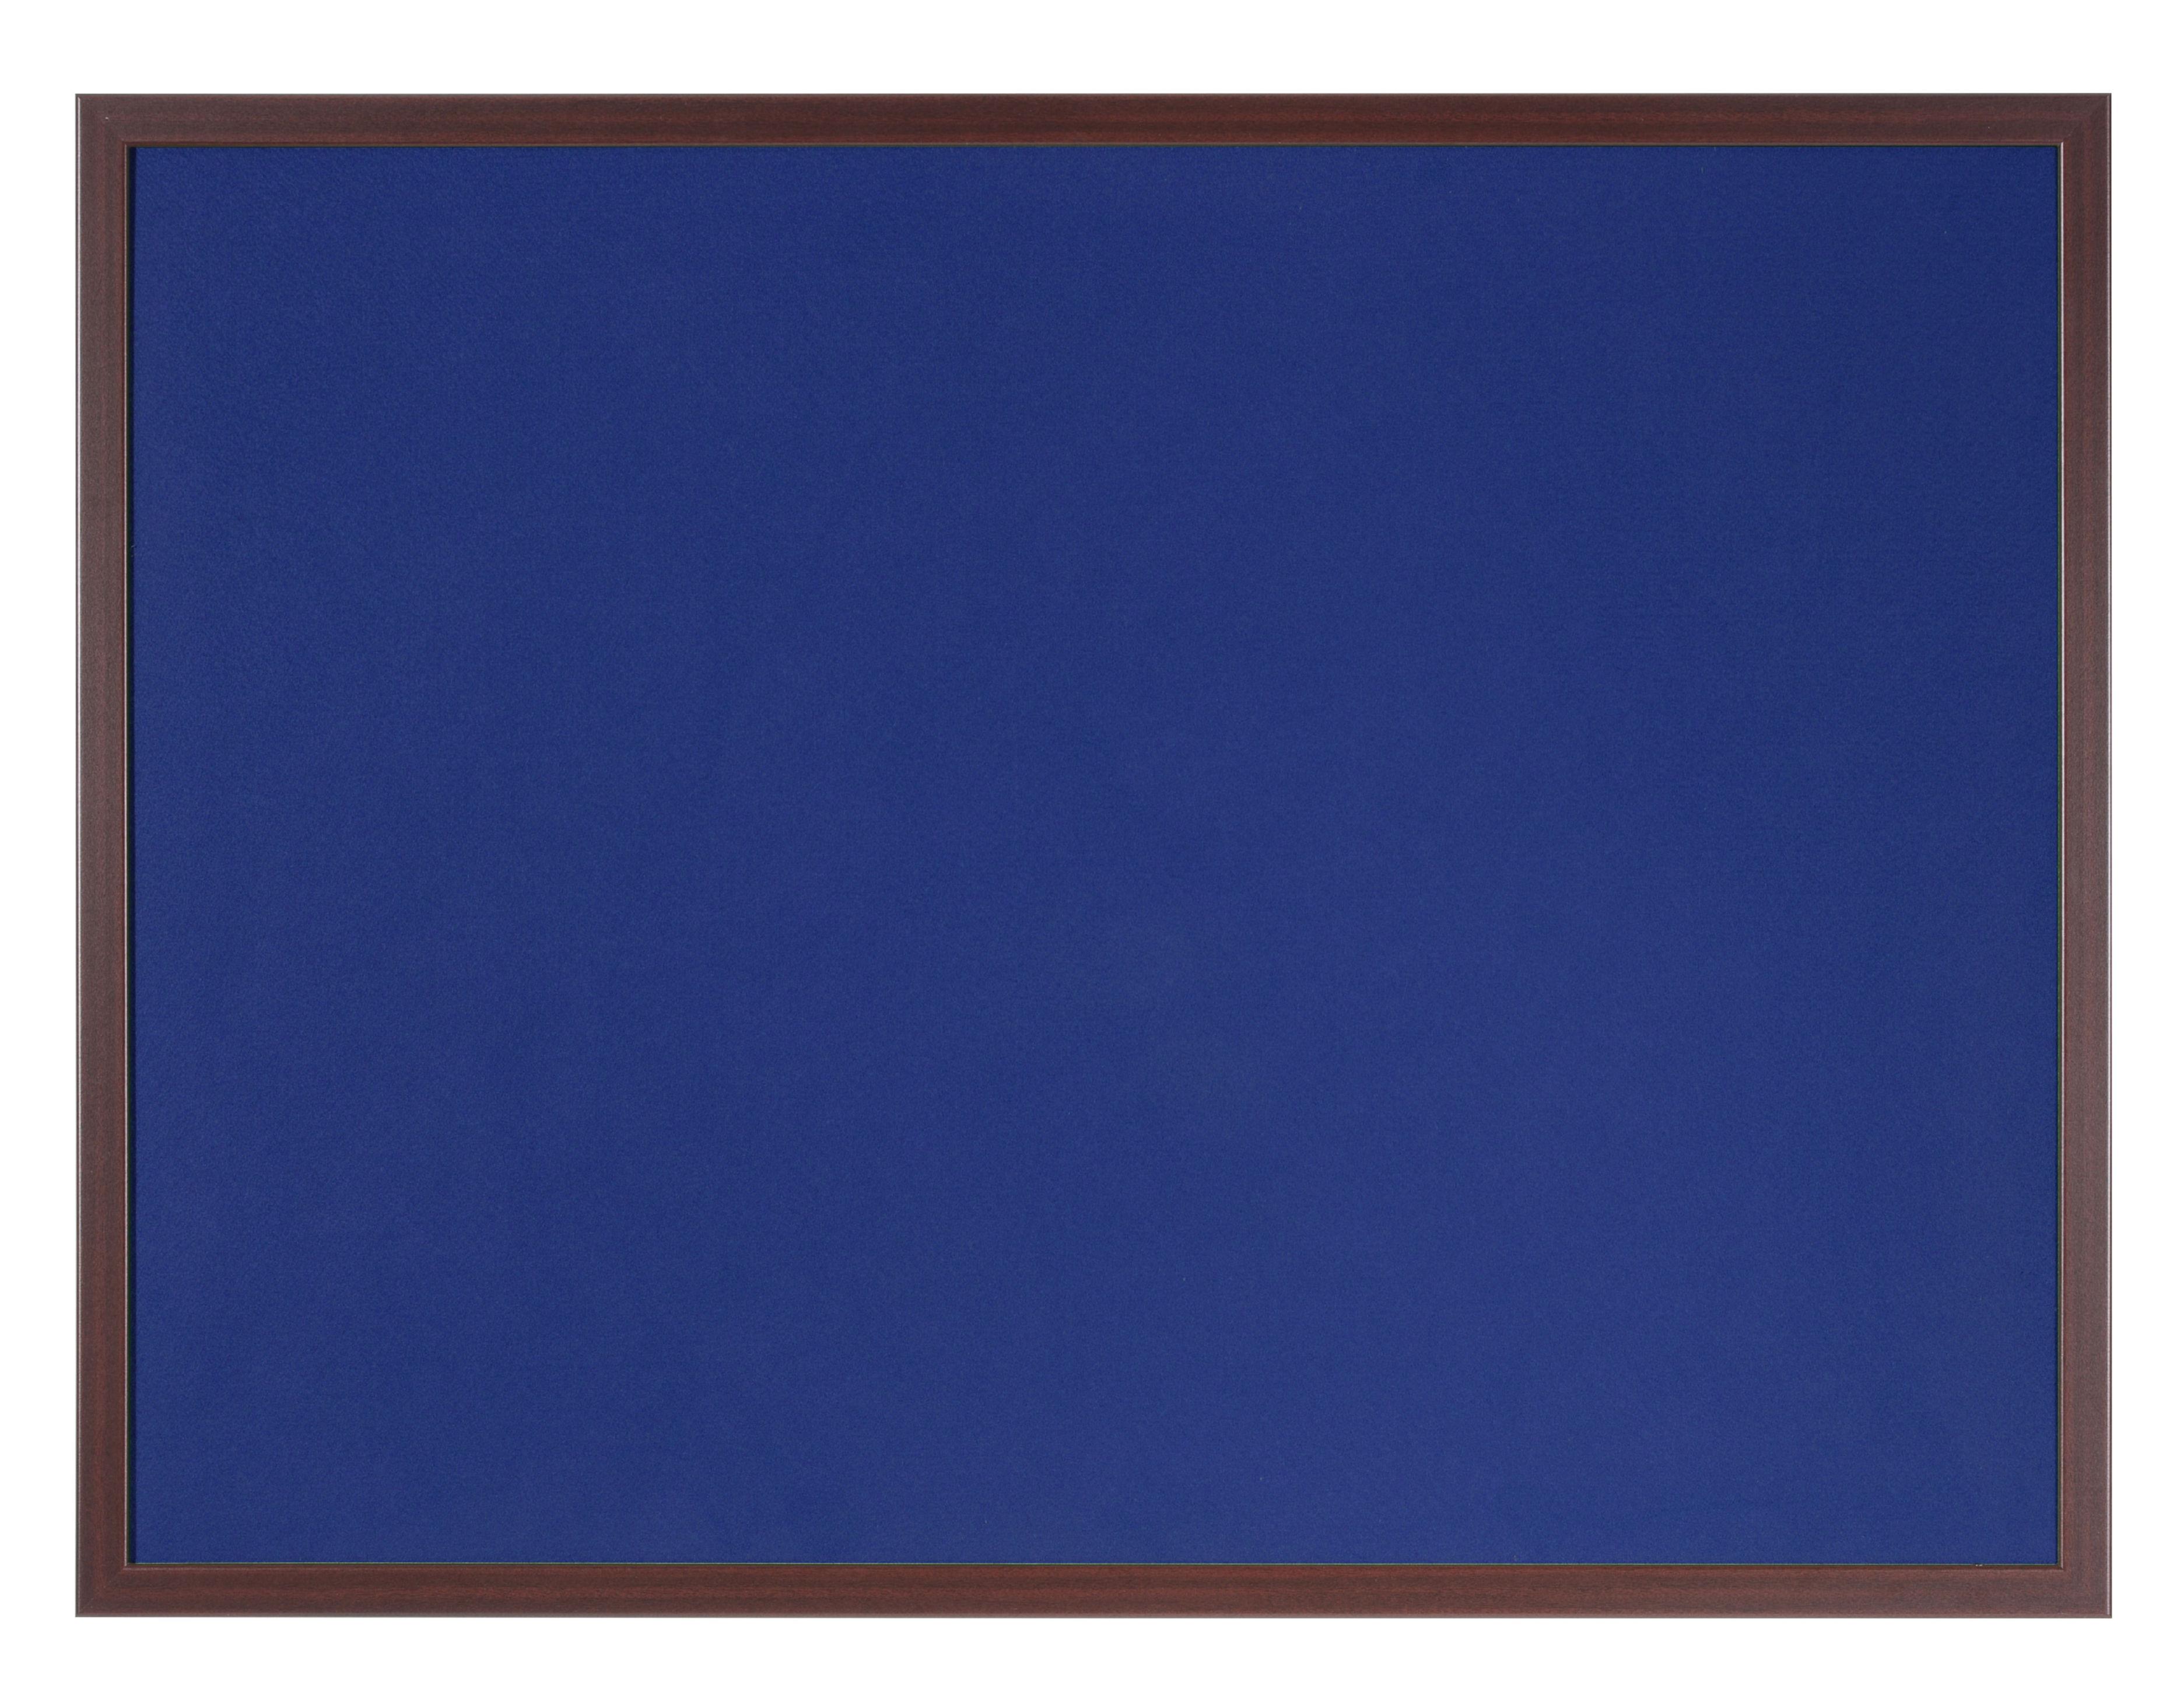 Felt Bi-Office Earth-It Blue felt 240x120cm Cherry Wood 32 mm